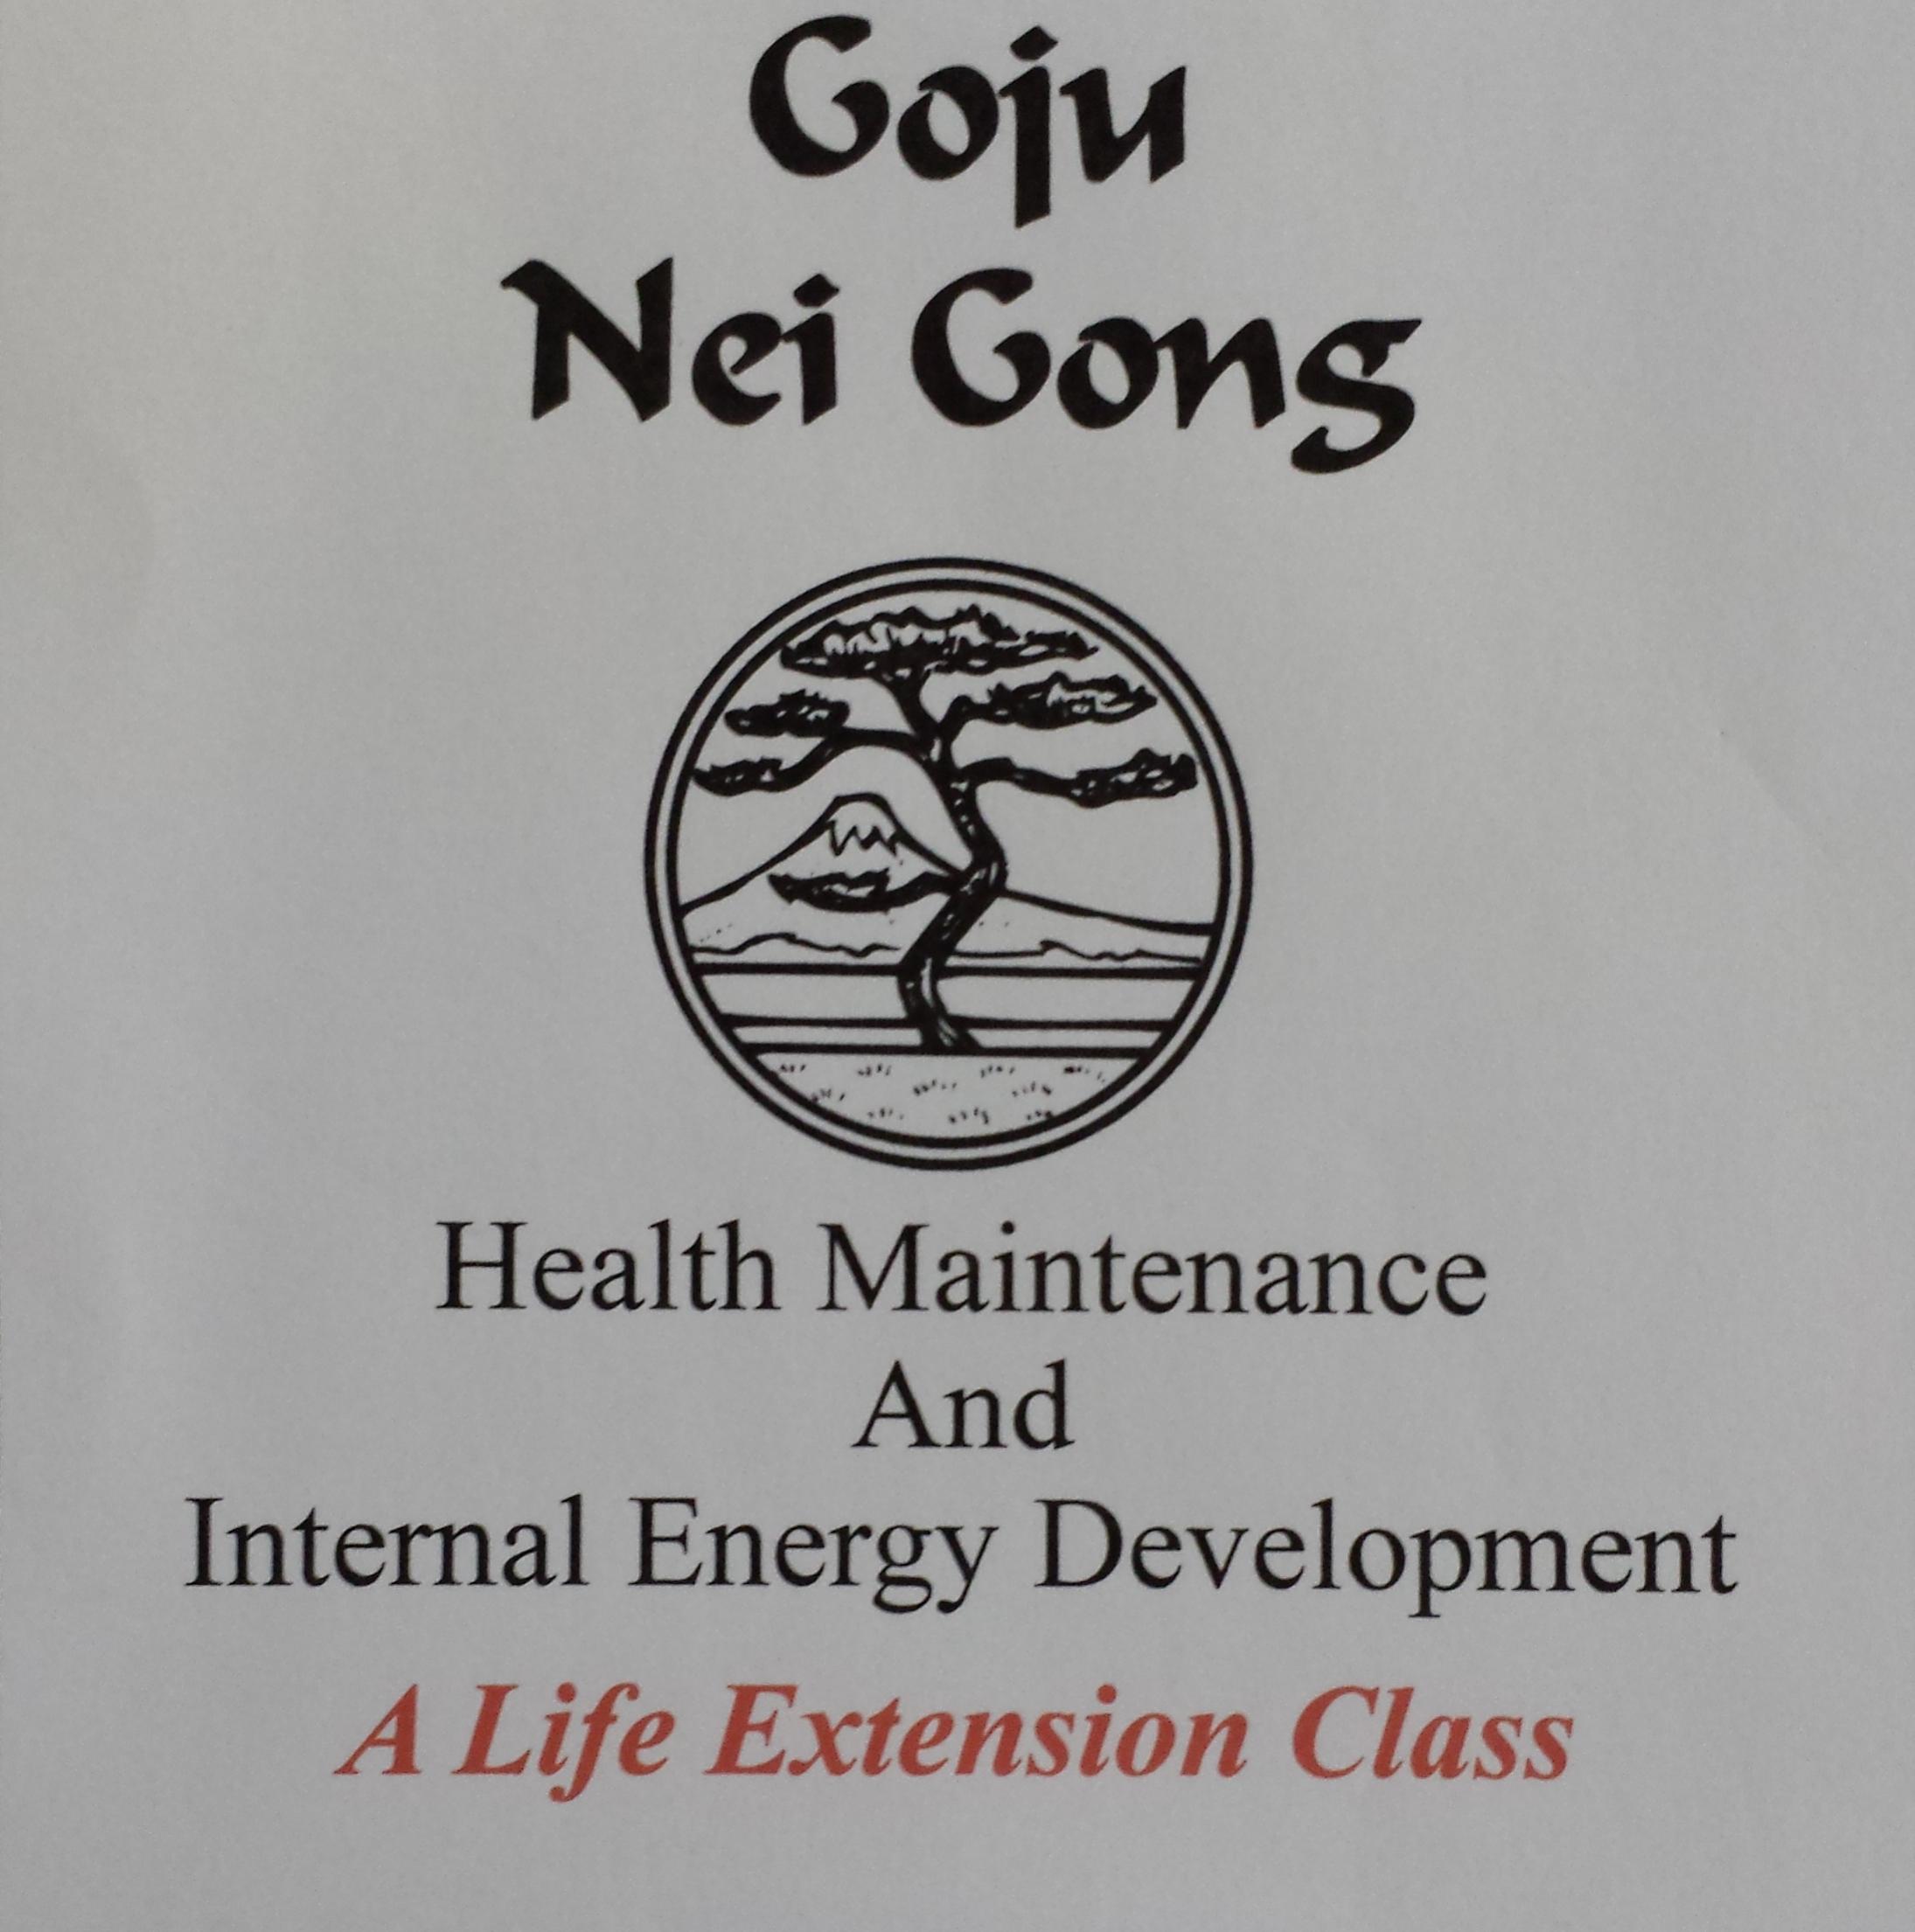 Goju New Gong